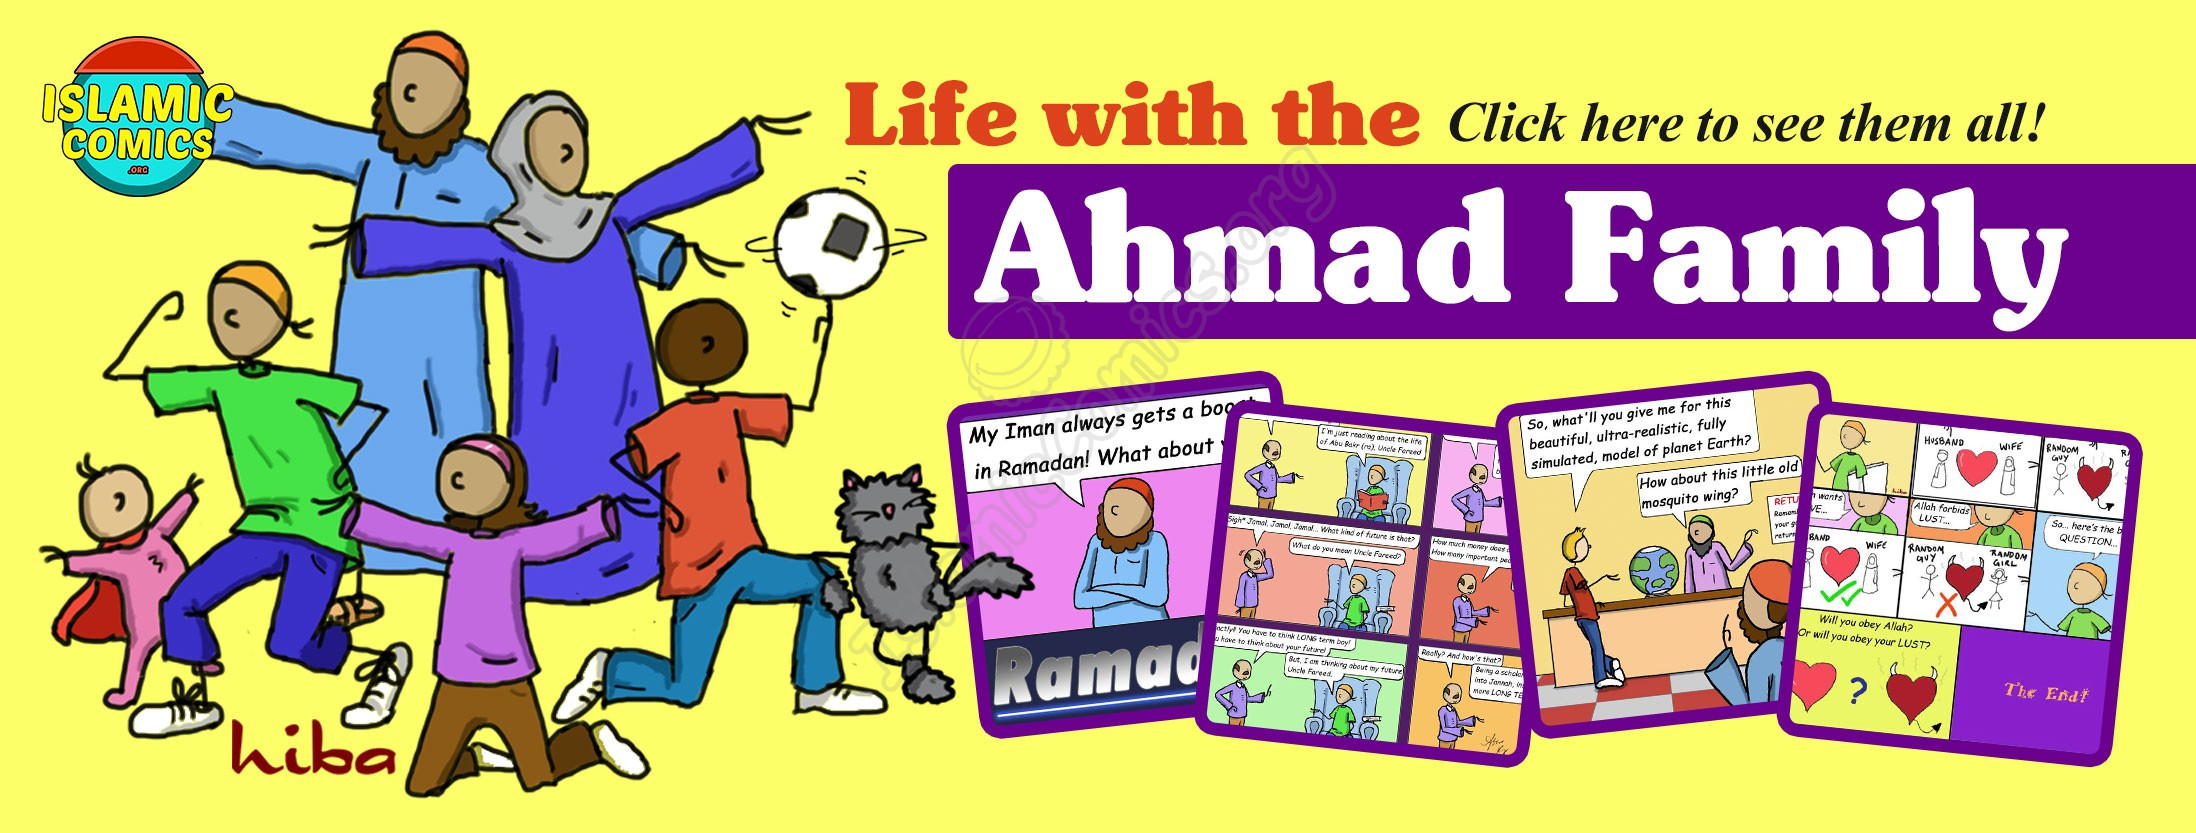 Life with the Ahmad Family Comics by Hiba Magazine - Islamic Comics